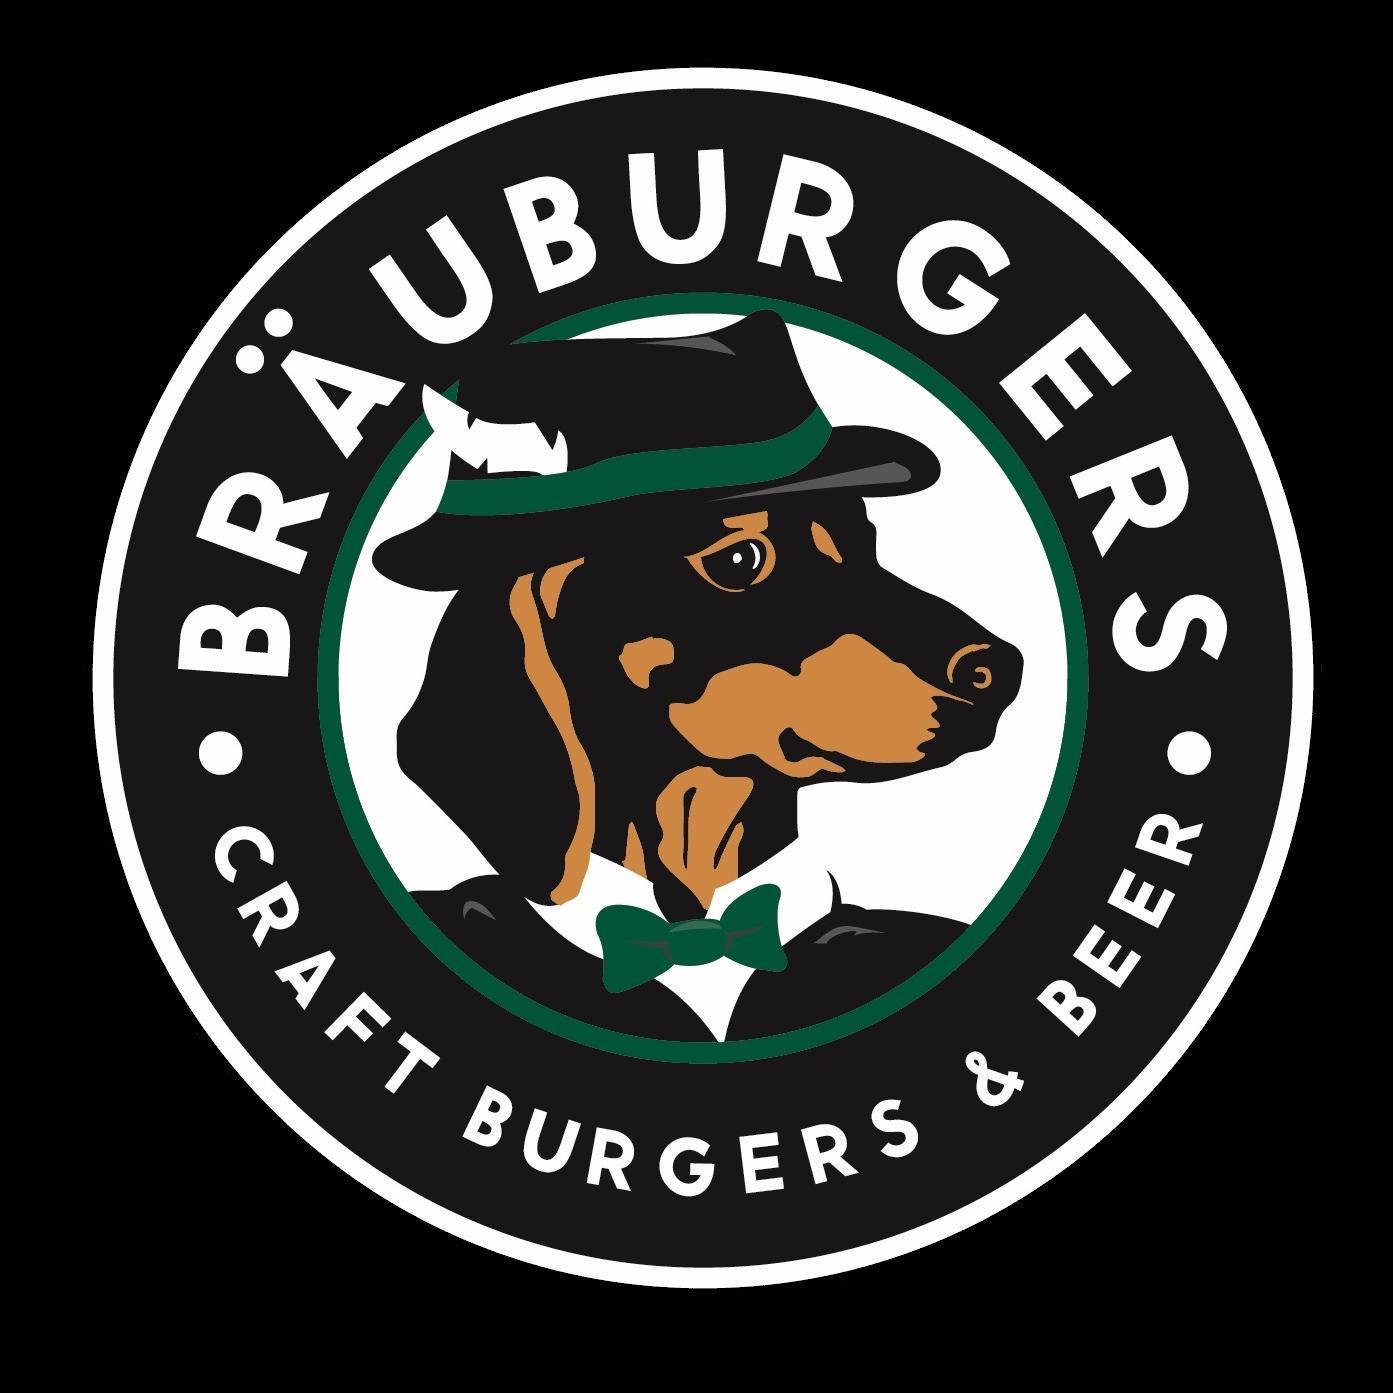 brauburger-craft-burgers-beer